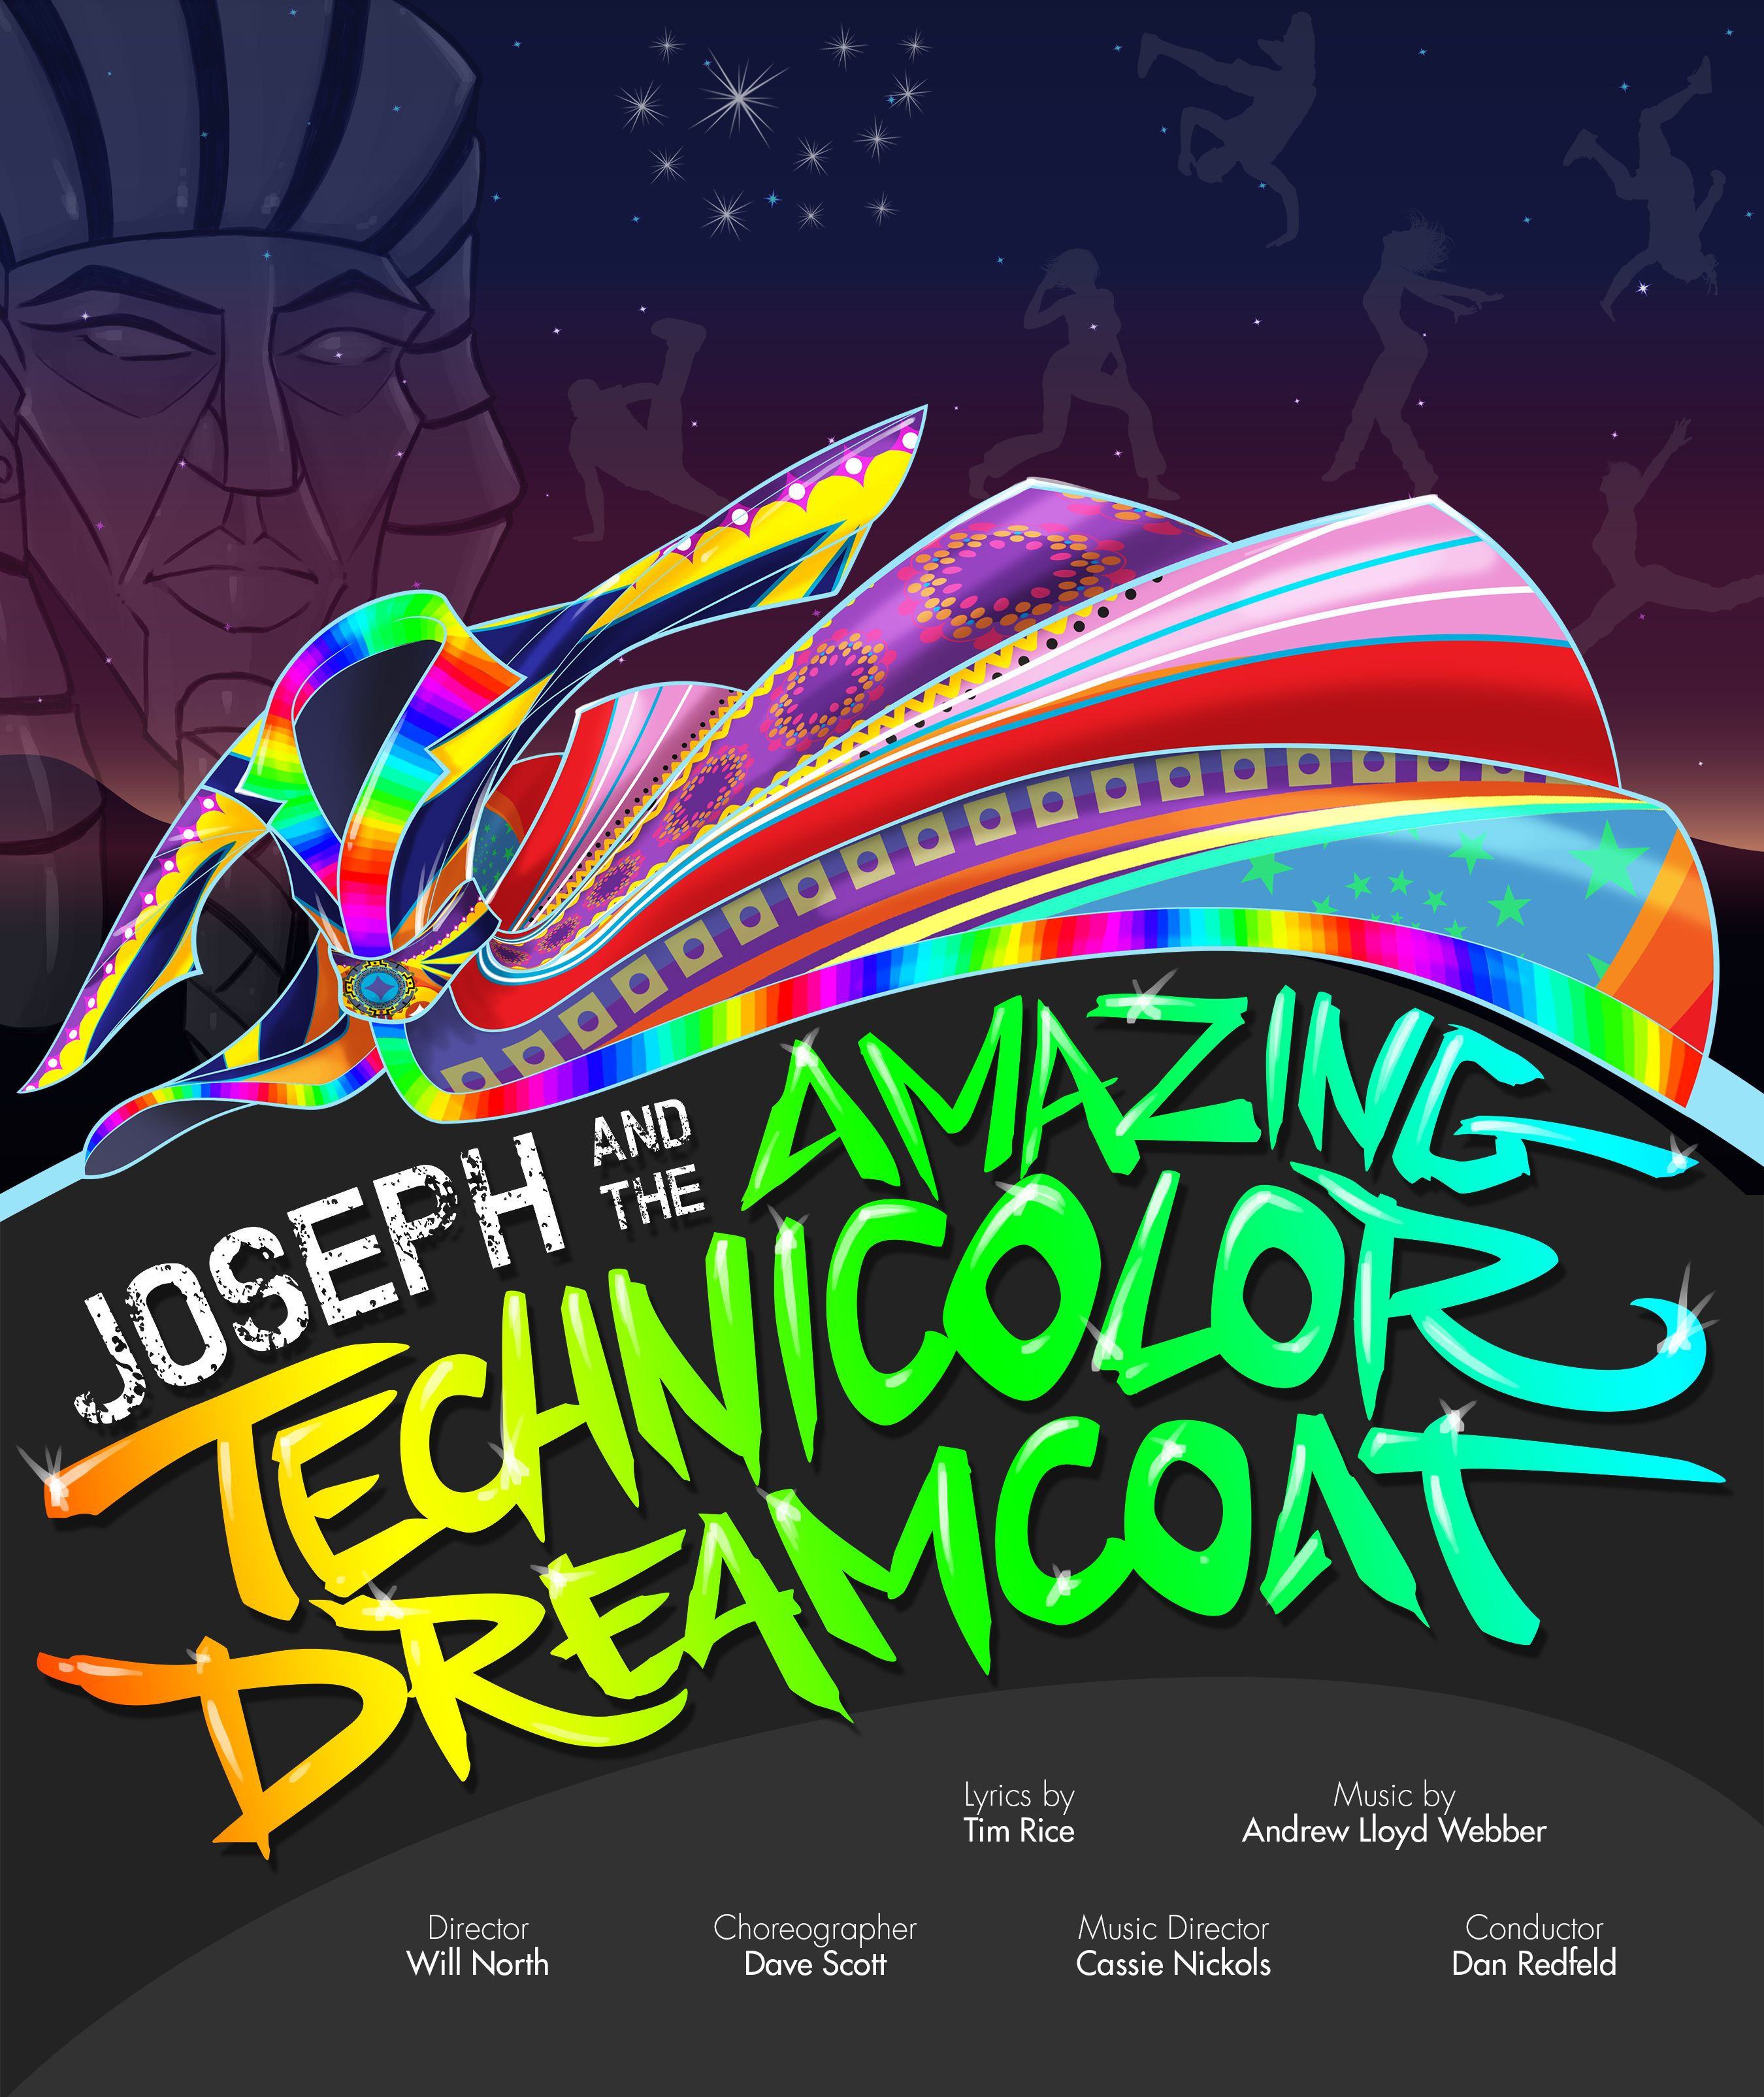 Joseph Amp The Amazing Technicolor Dreamcoat